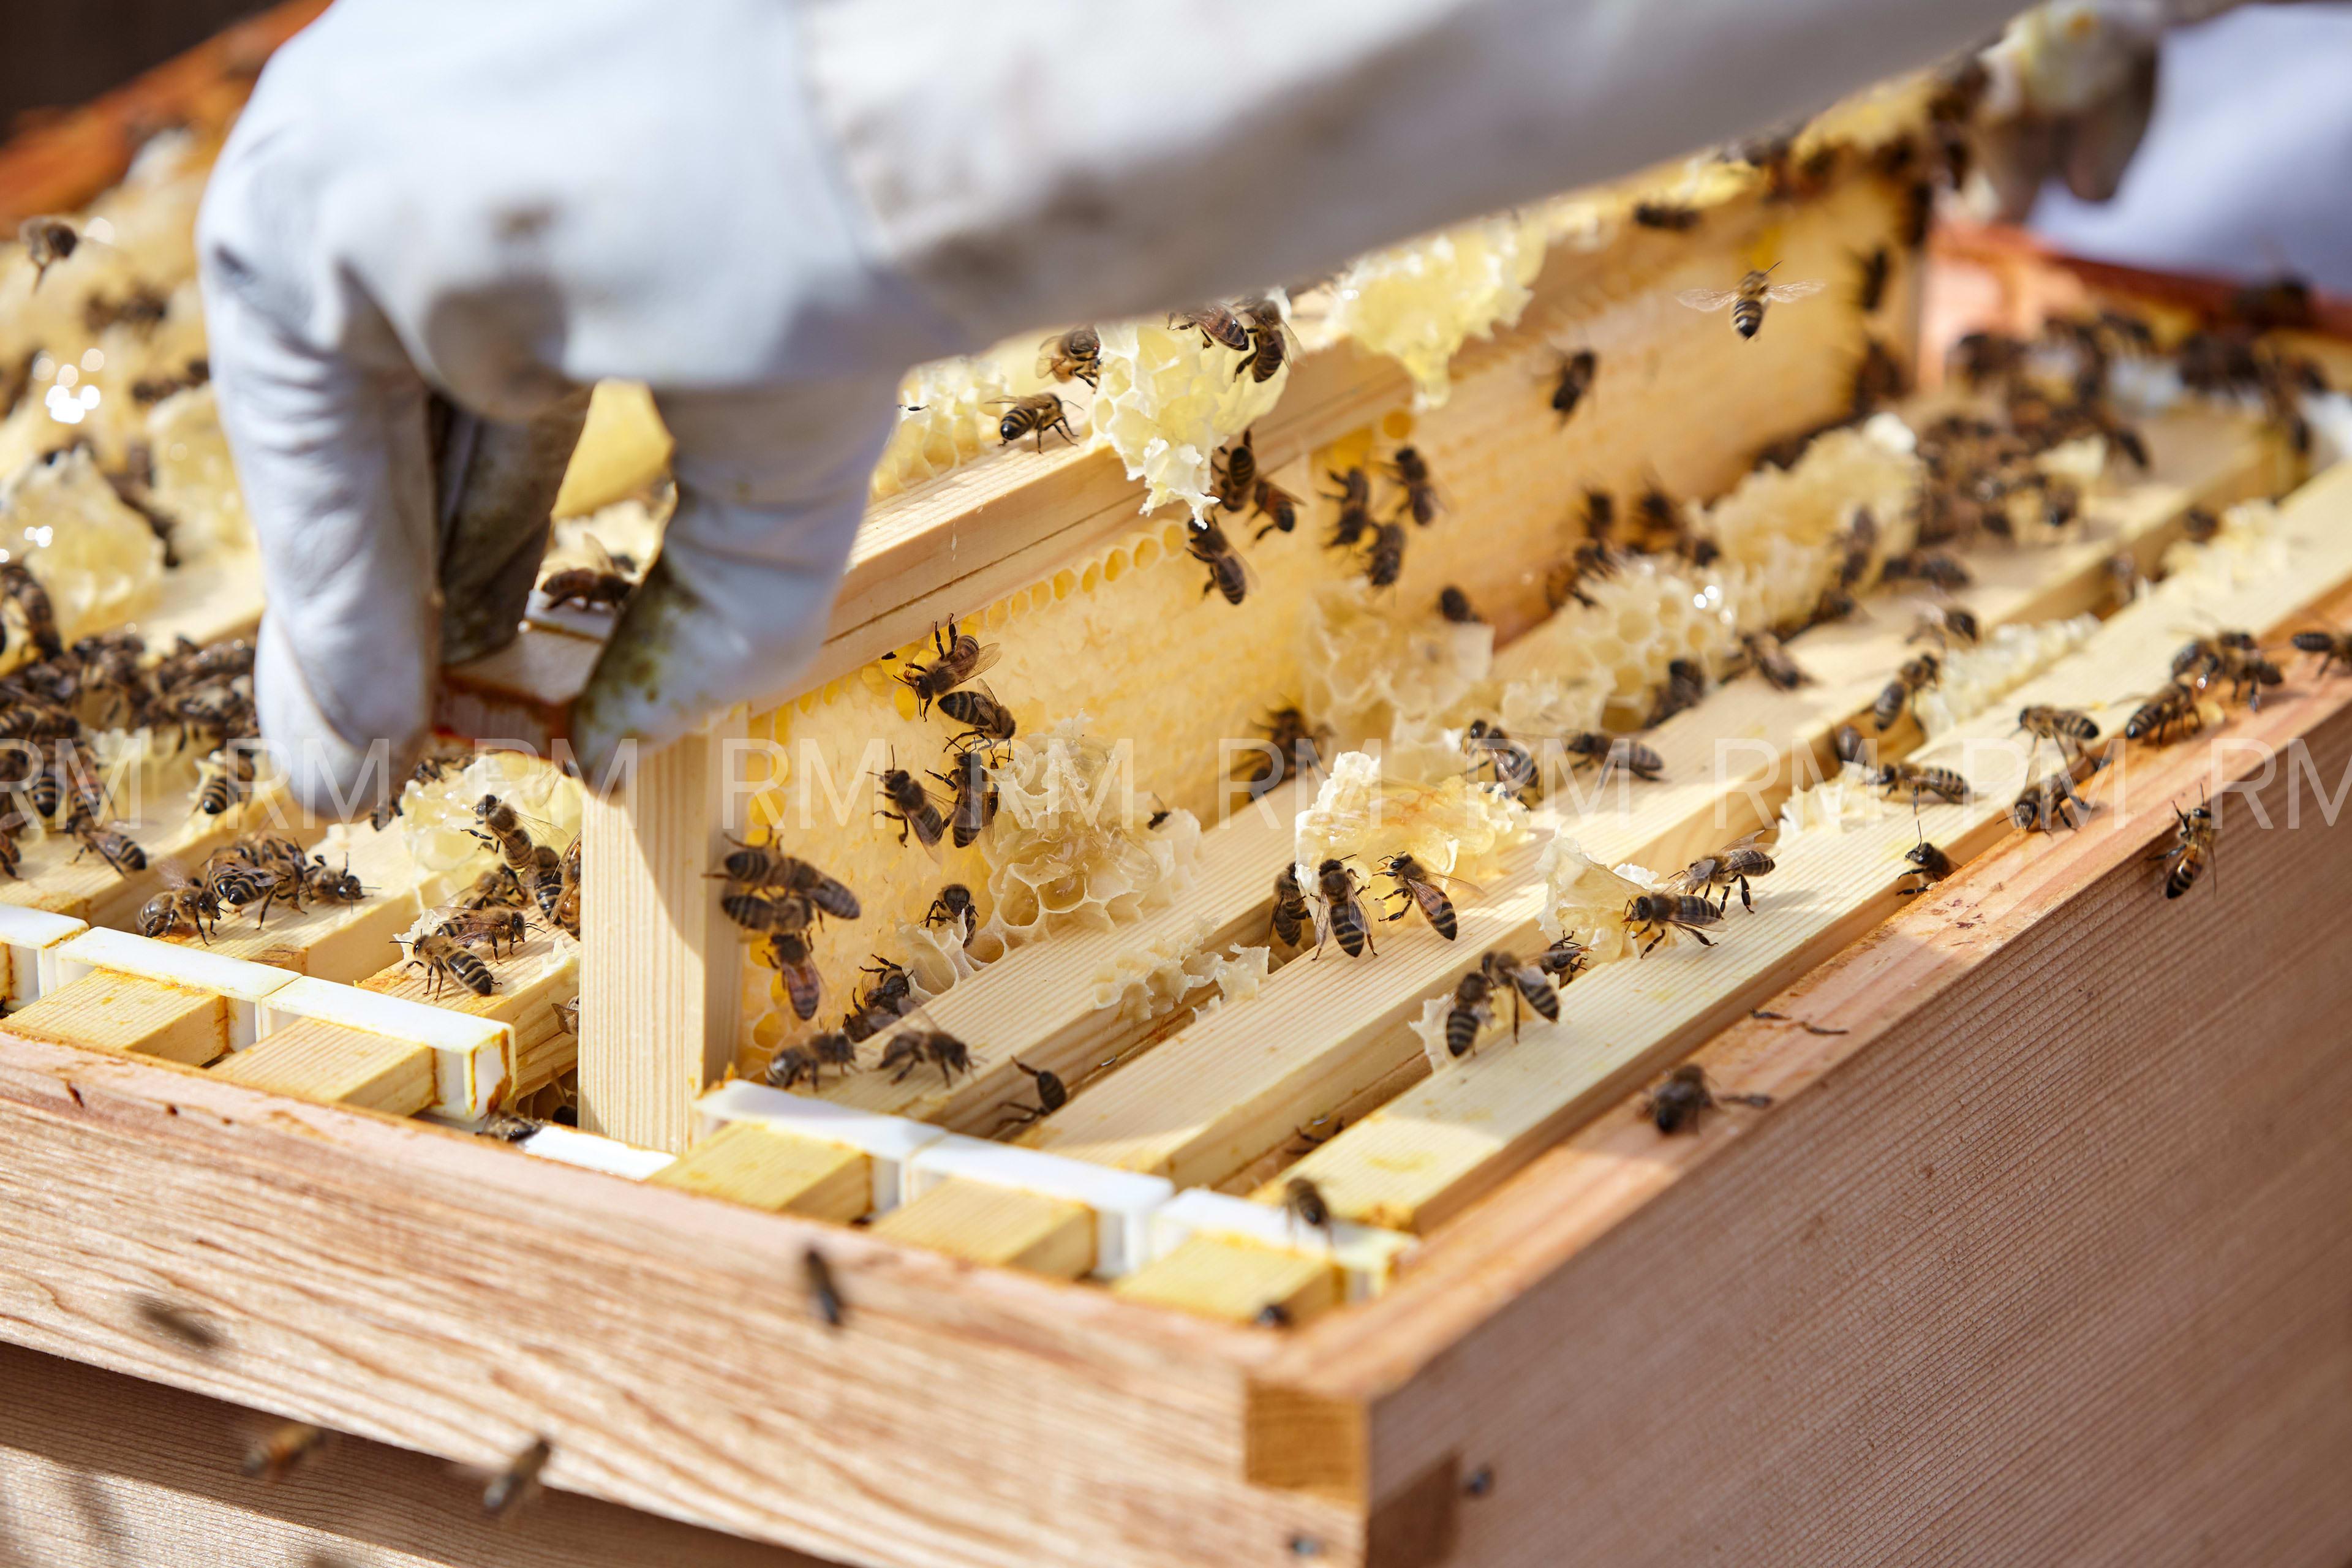 Richard Moran Bees 002